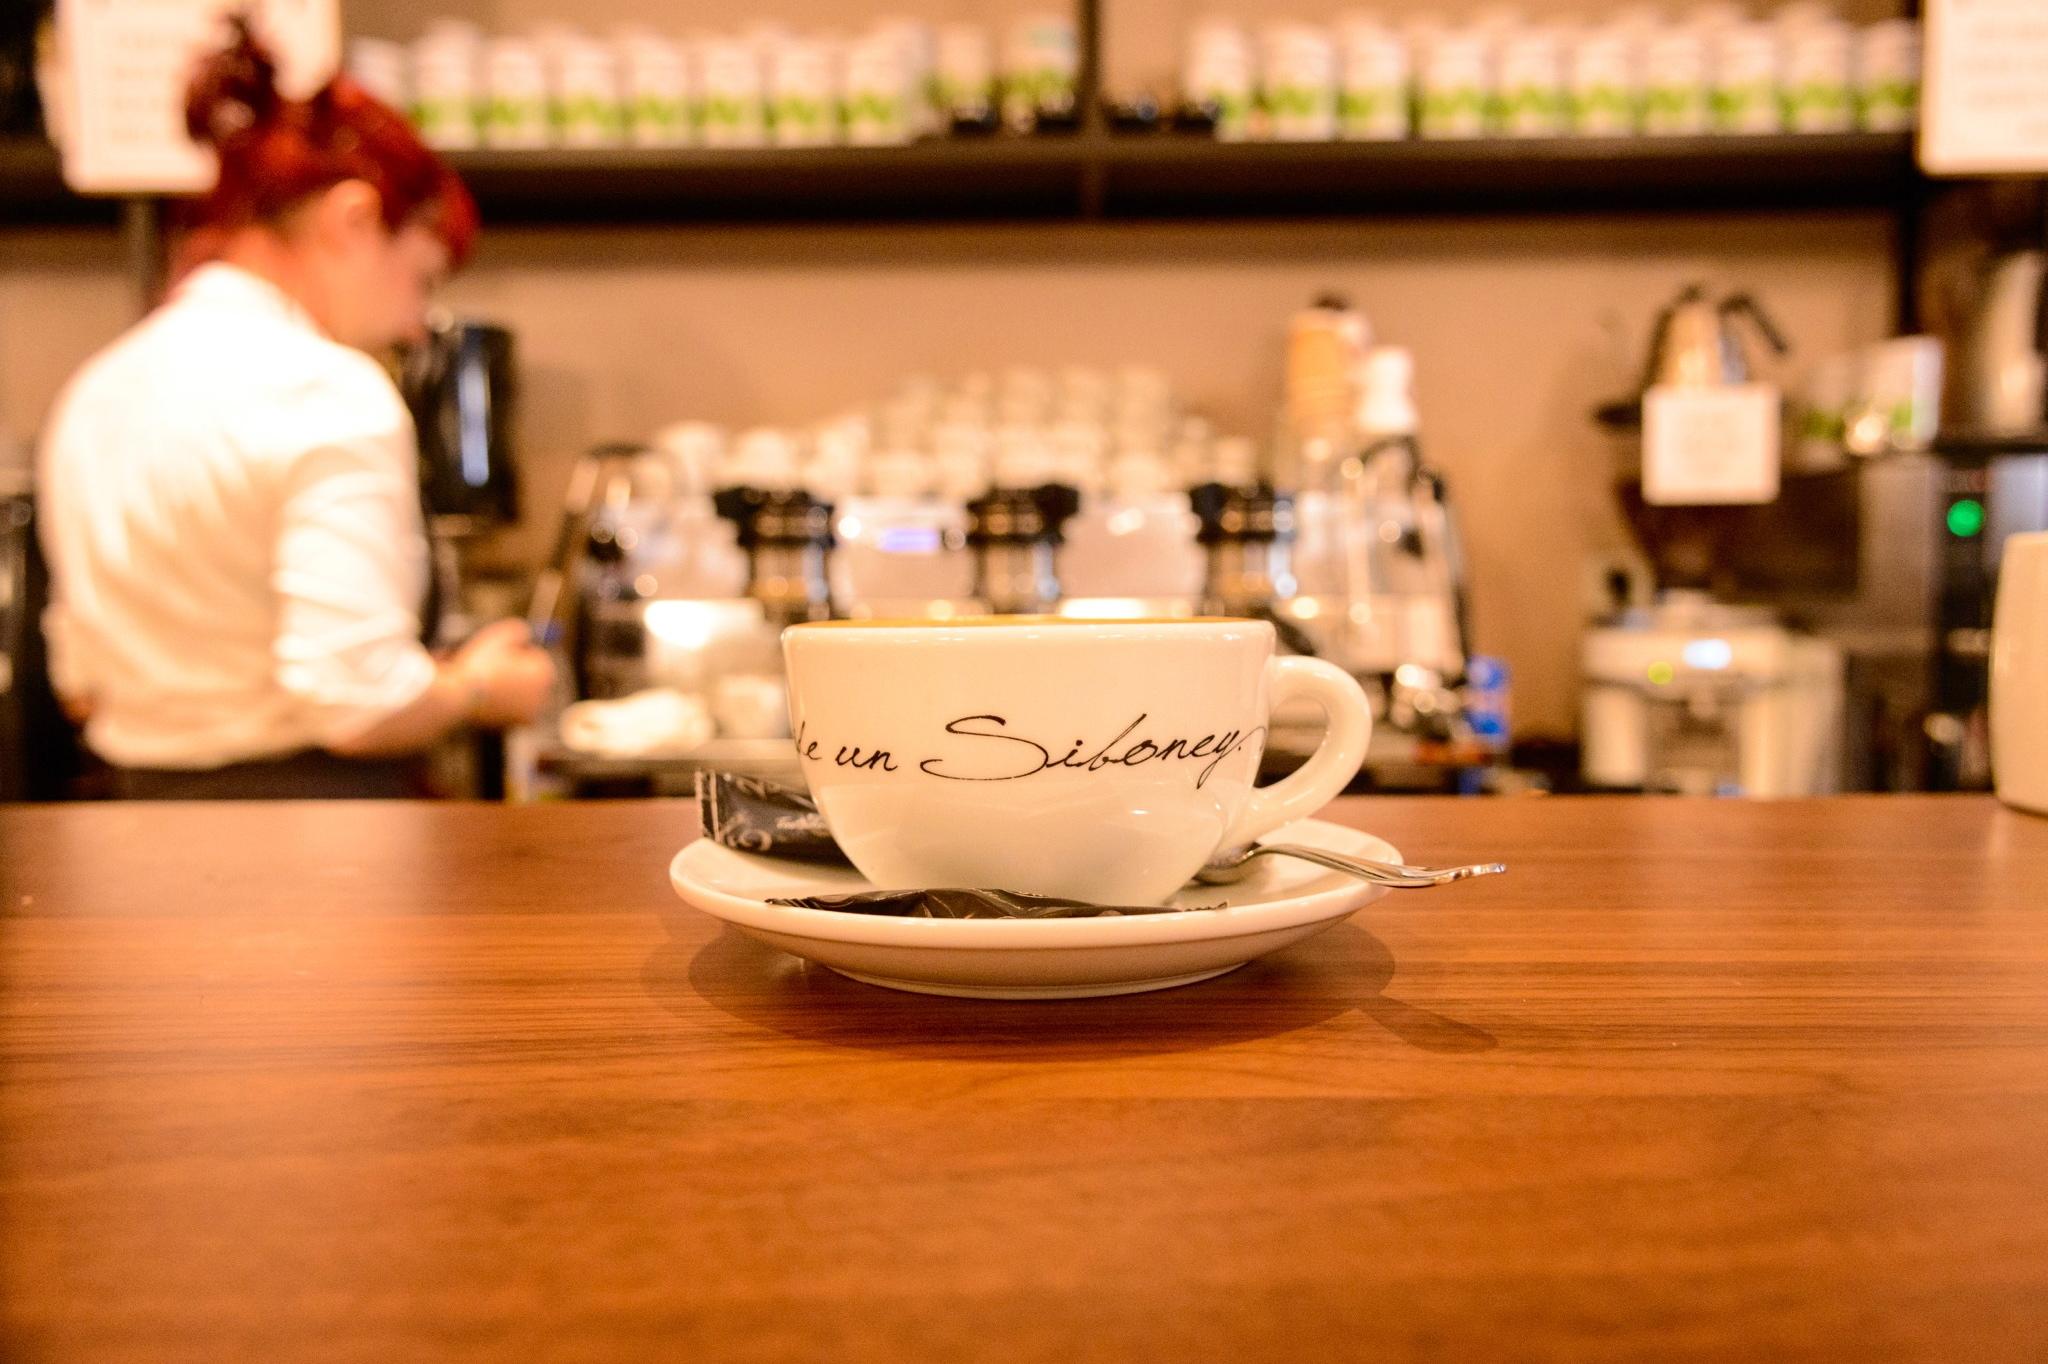 Cafes Siboney Coruna, Spain